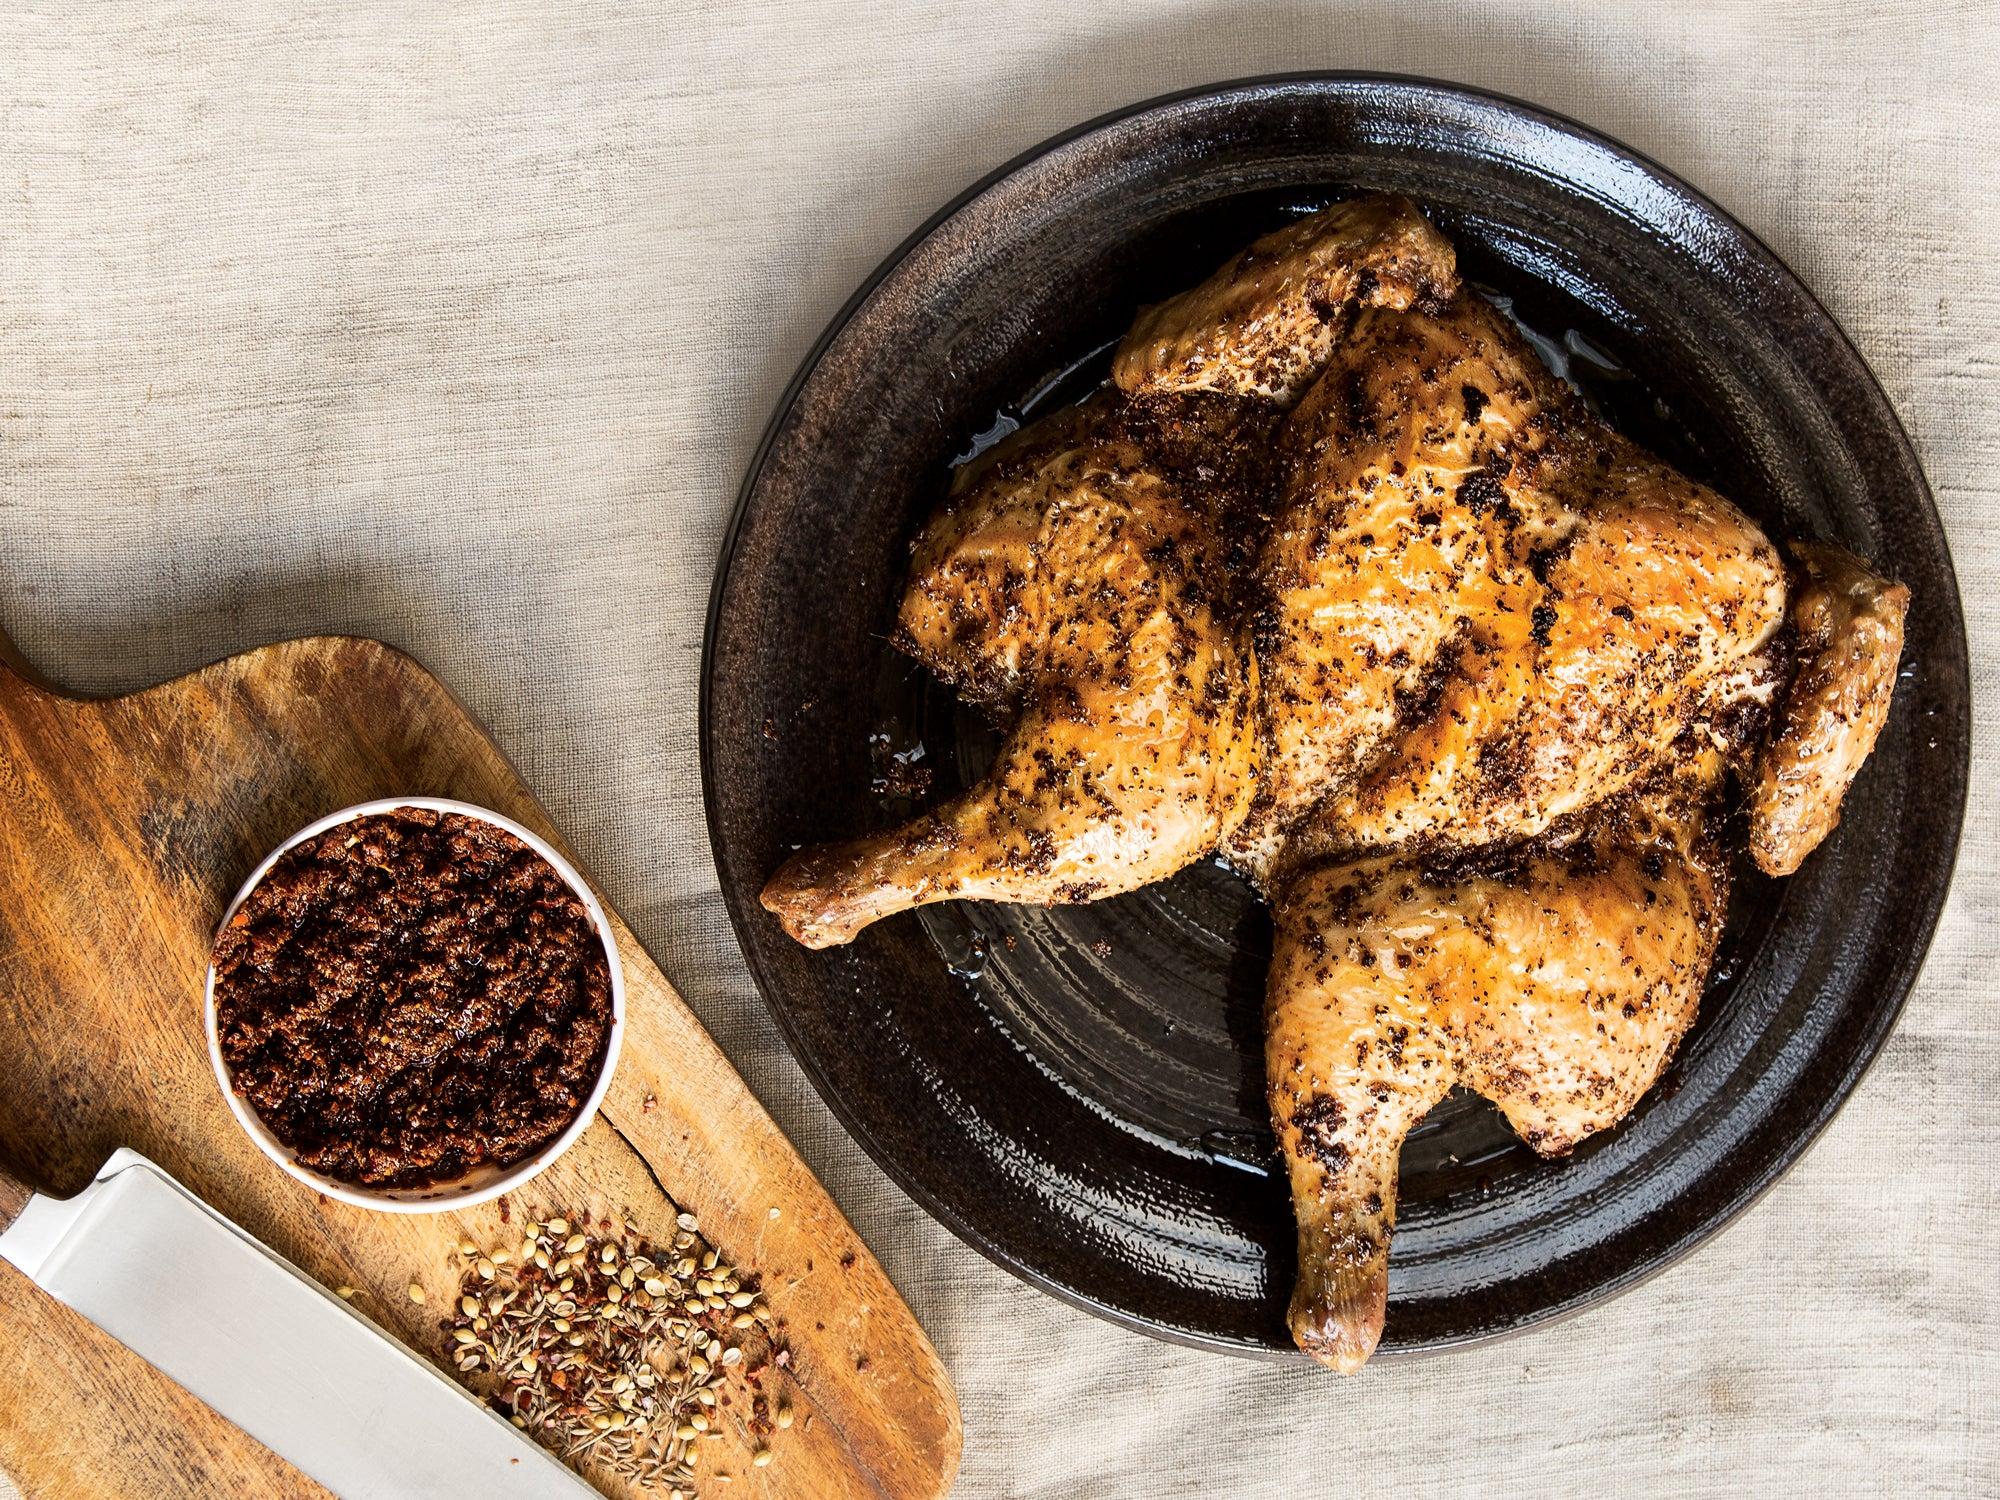 Roasted Chicken with Harissa